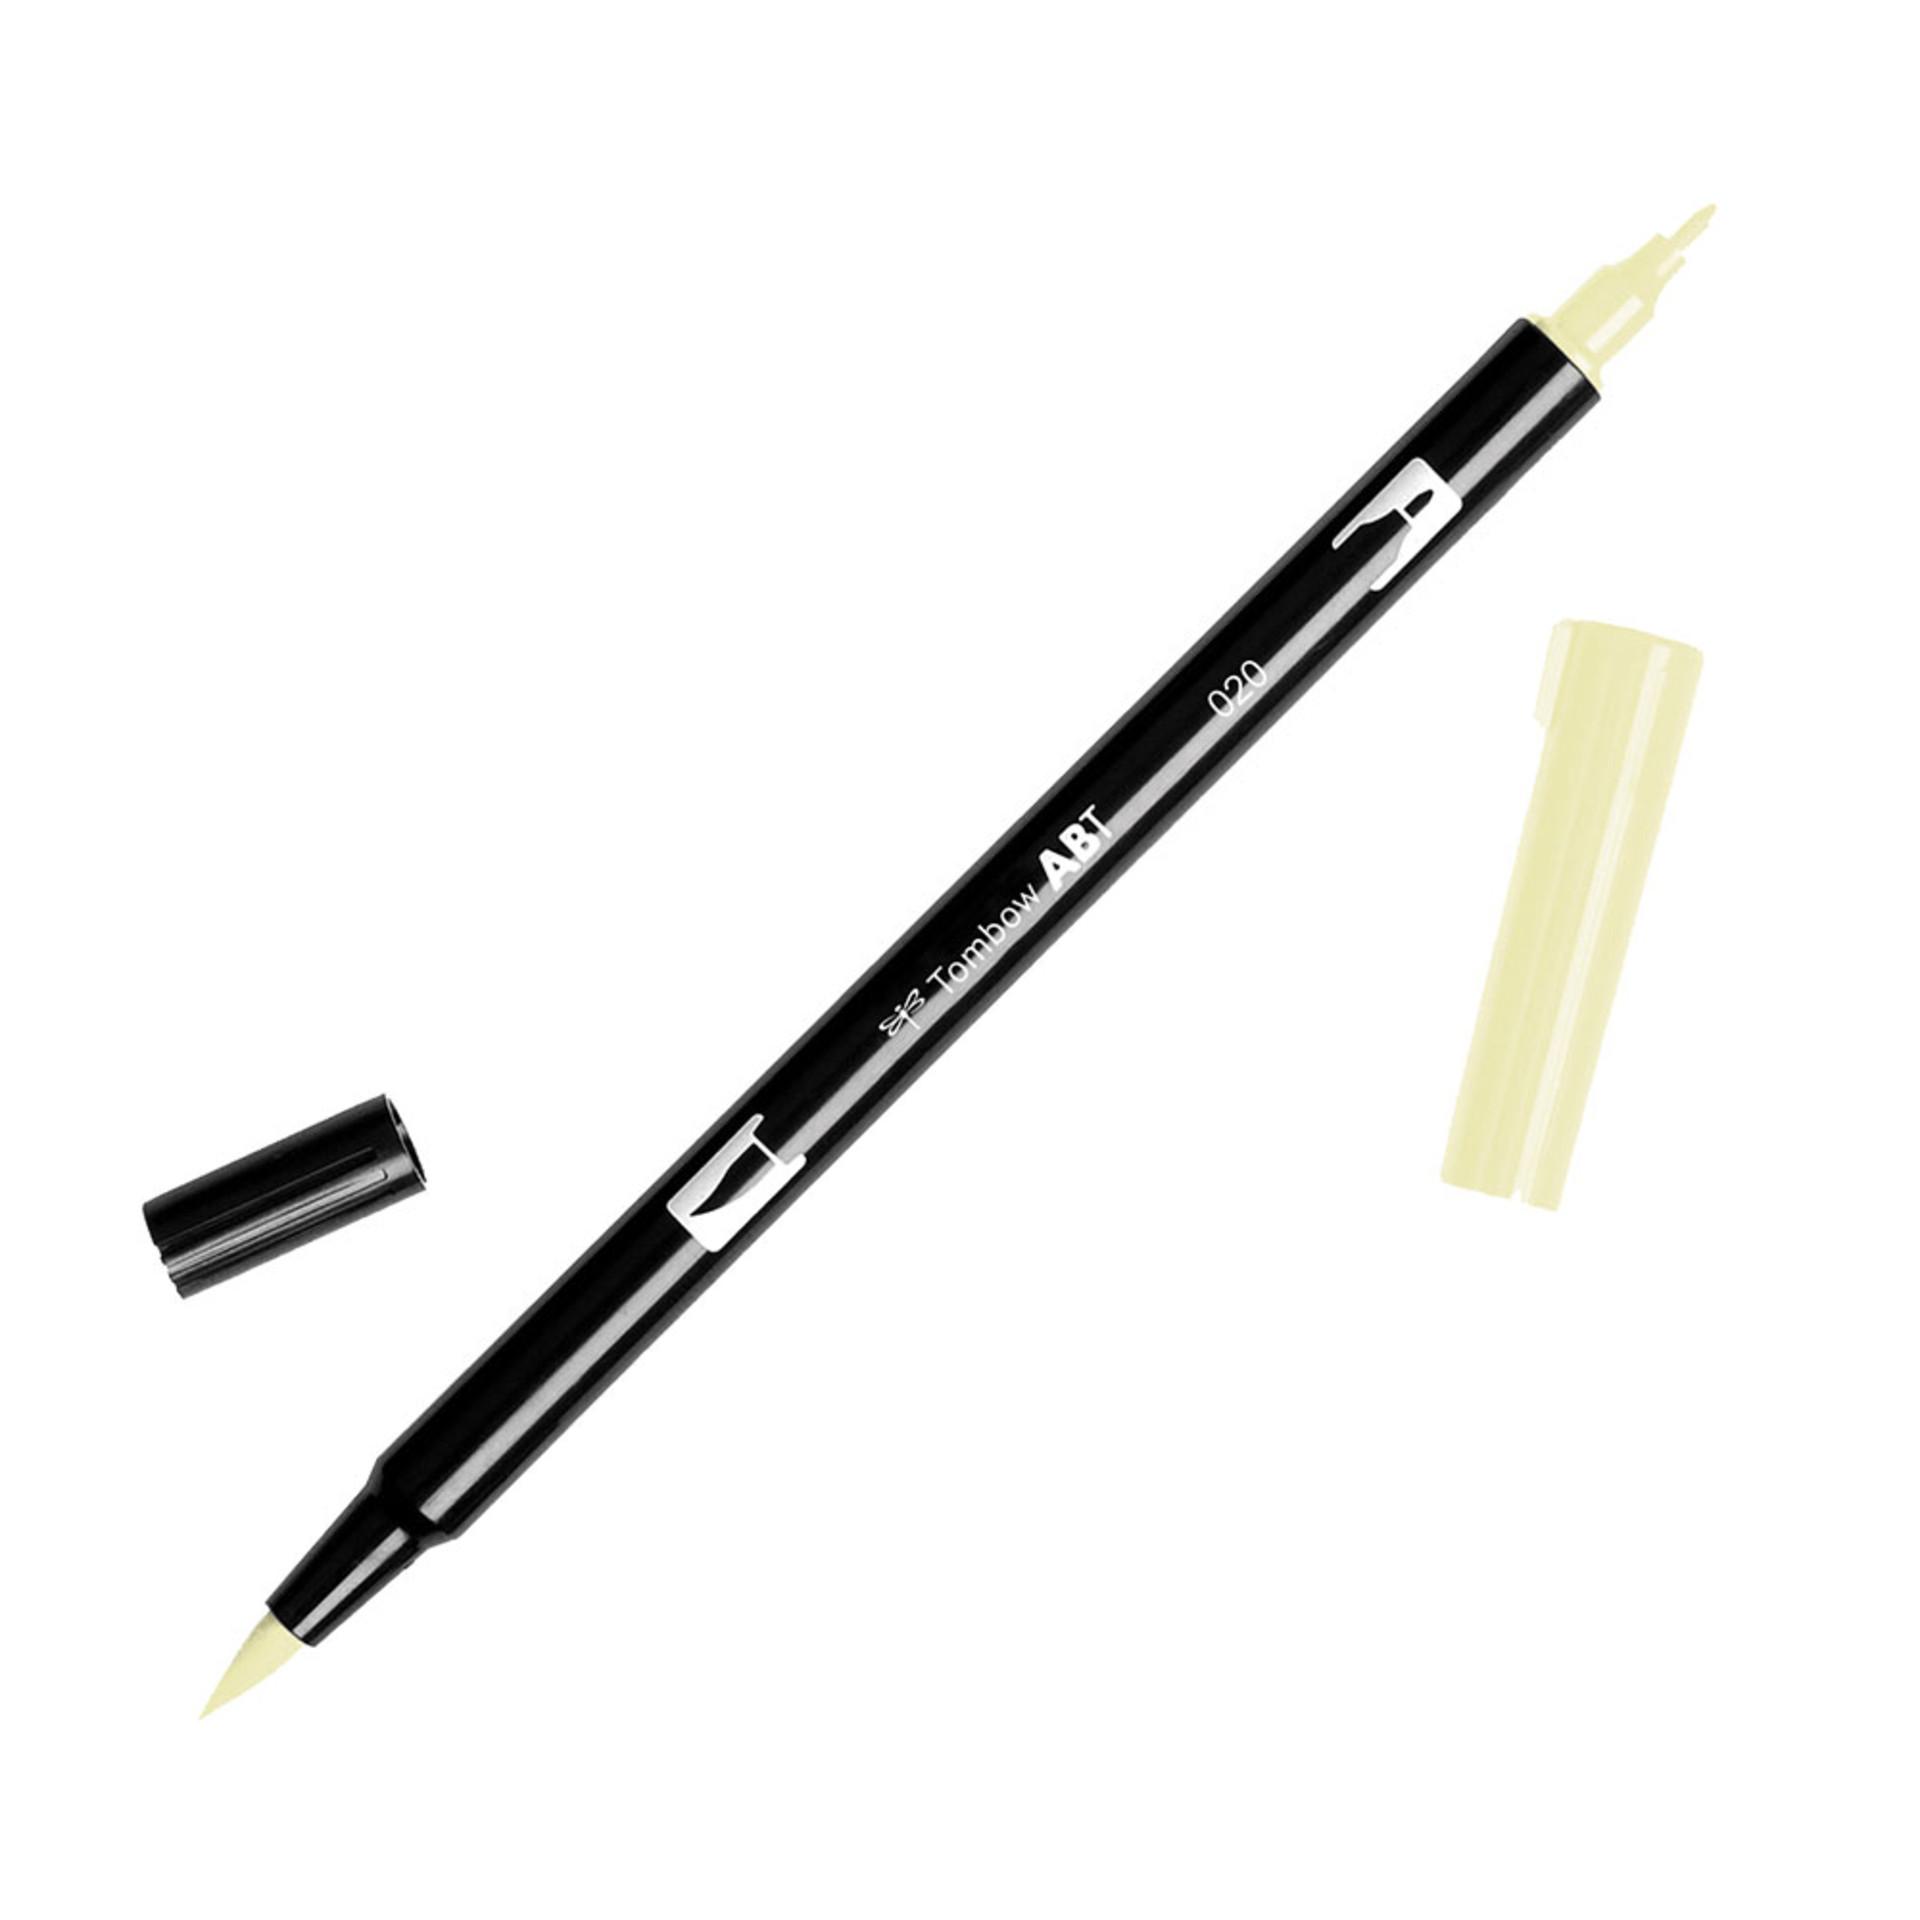 Tombow Dual-Tip Brush Marker Pen – Peach